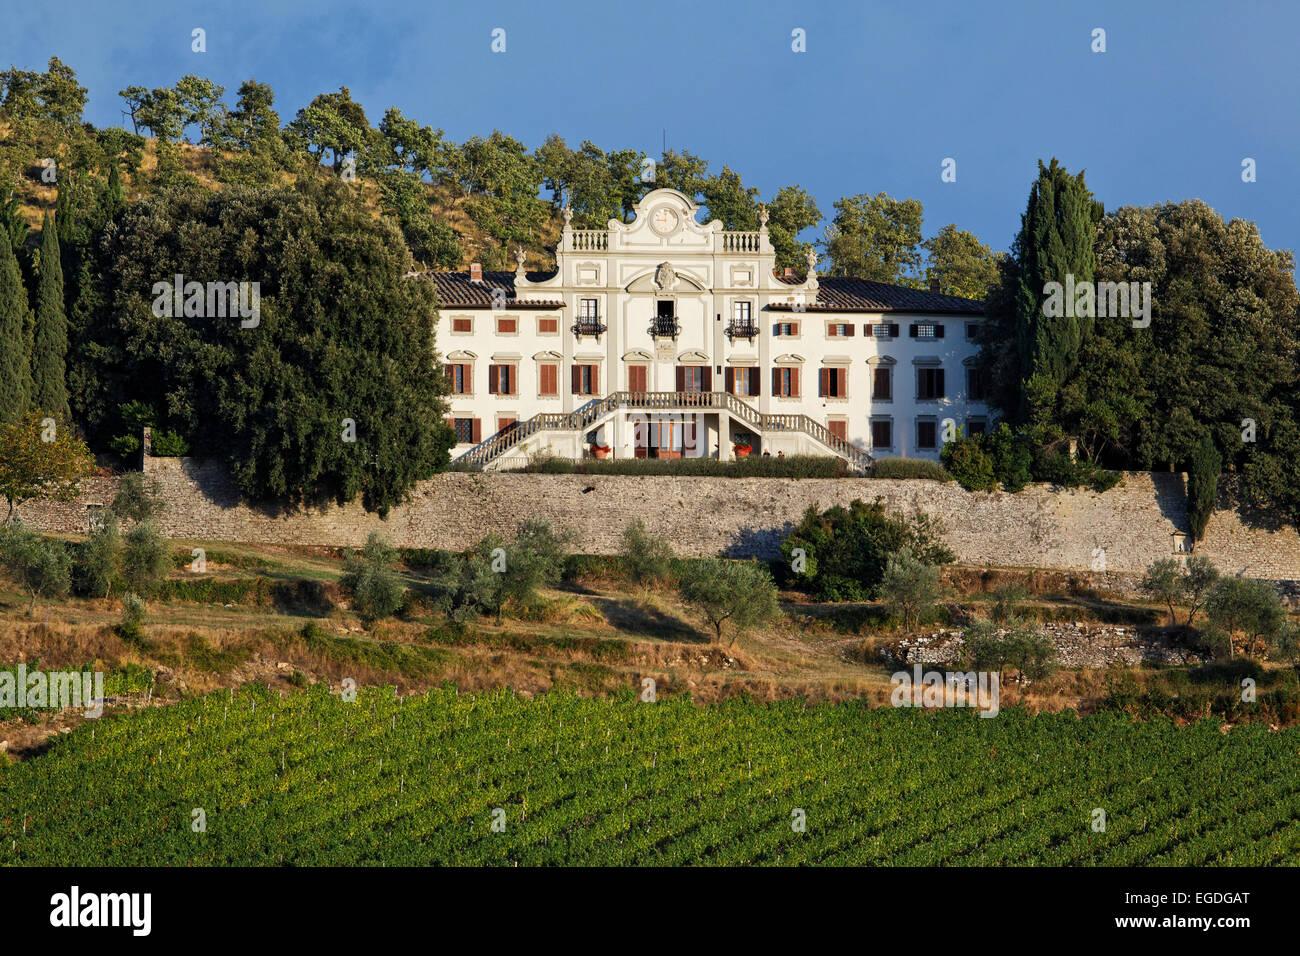 Winery Villa Vistarenni, Gaiole in Chianti, Tuscany, Italy ...